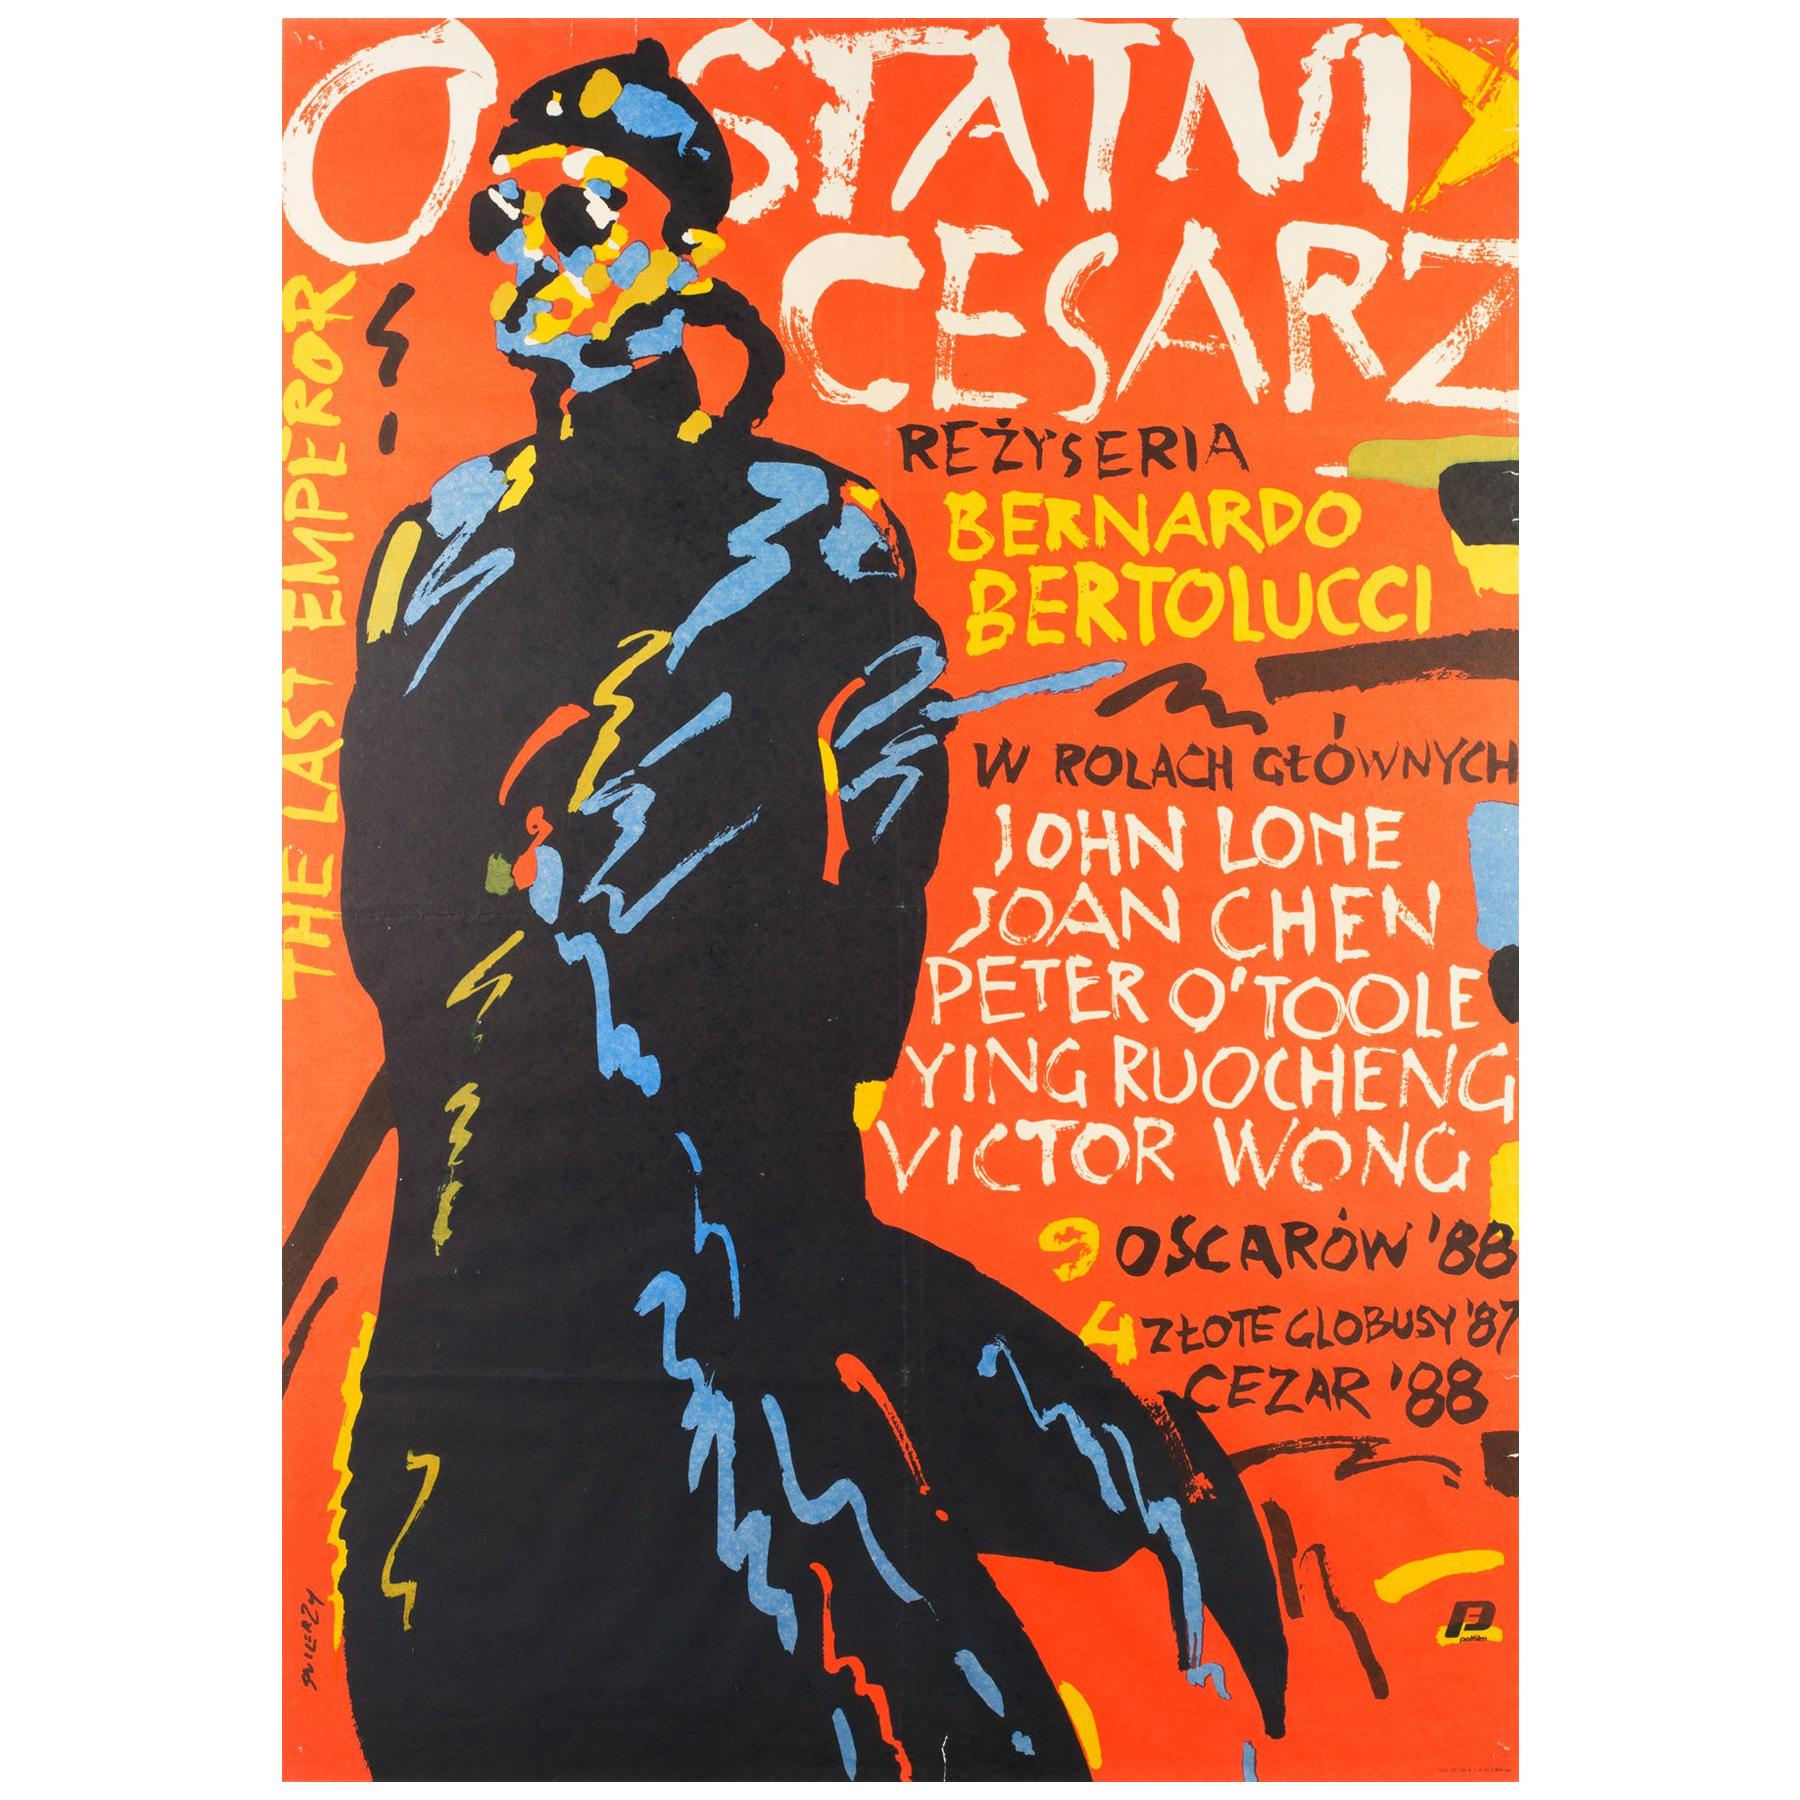 The Last Emperor Original Polish Film Poster Waldemar Swierzy, 1989